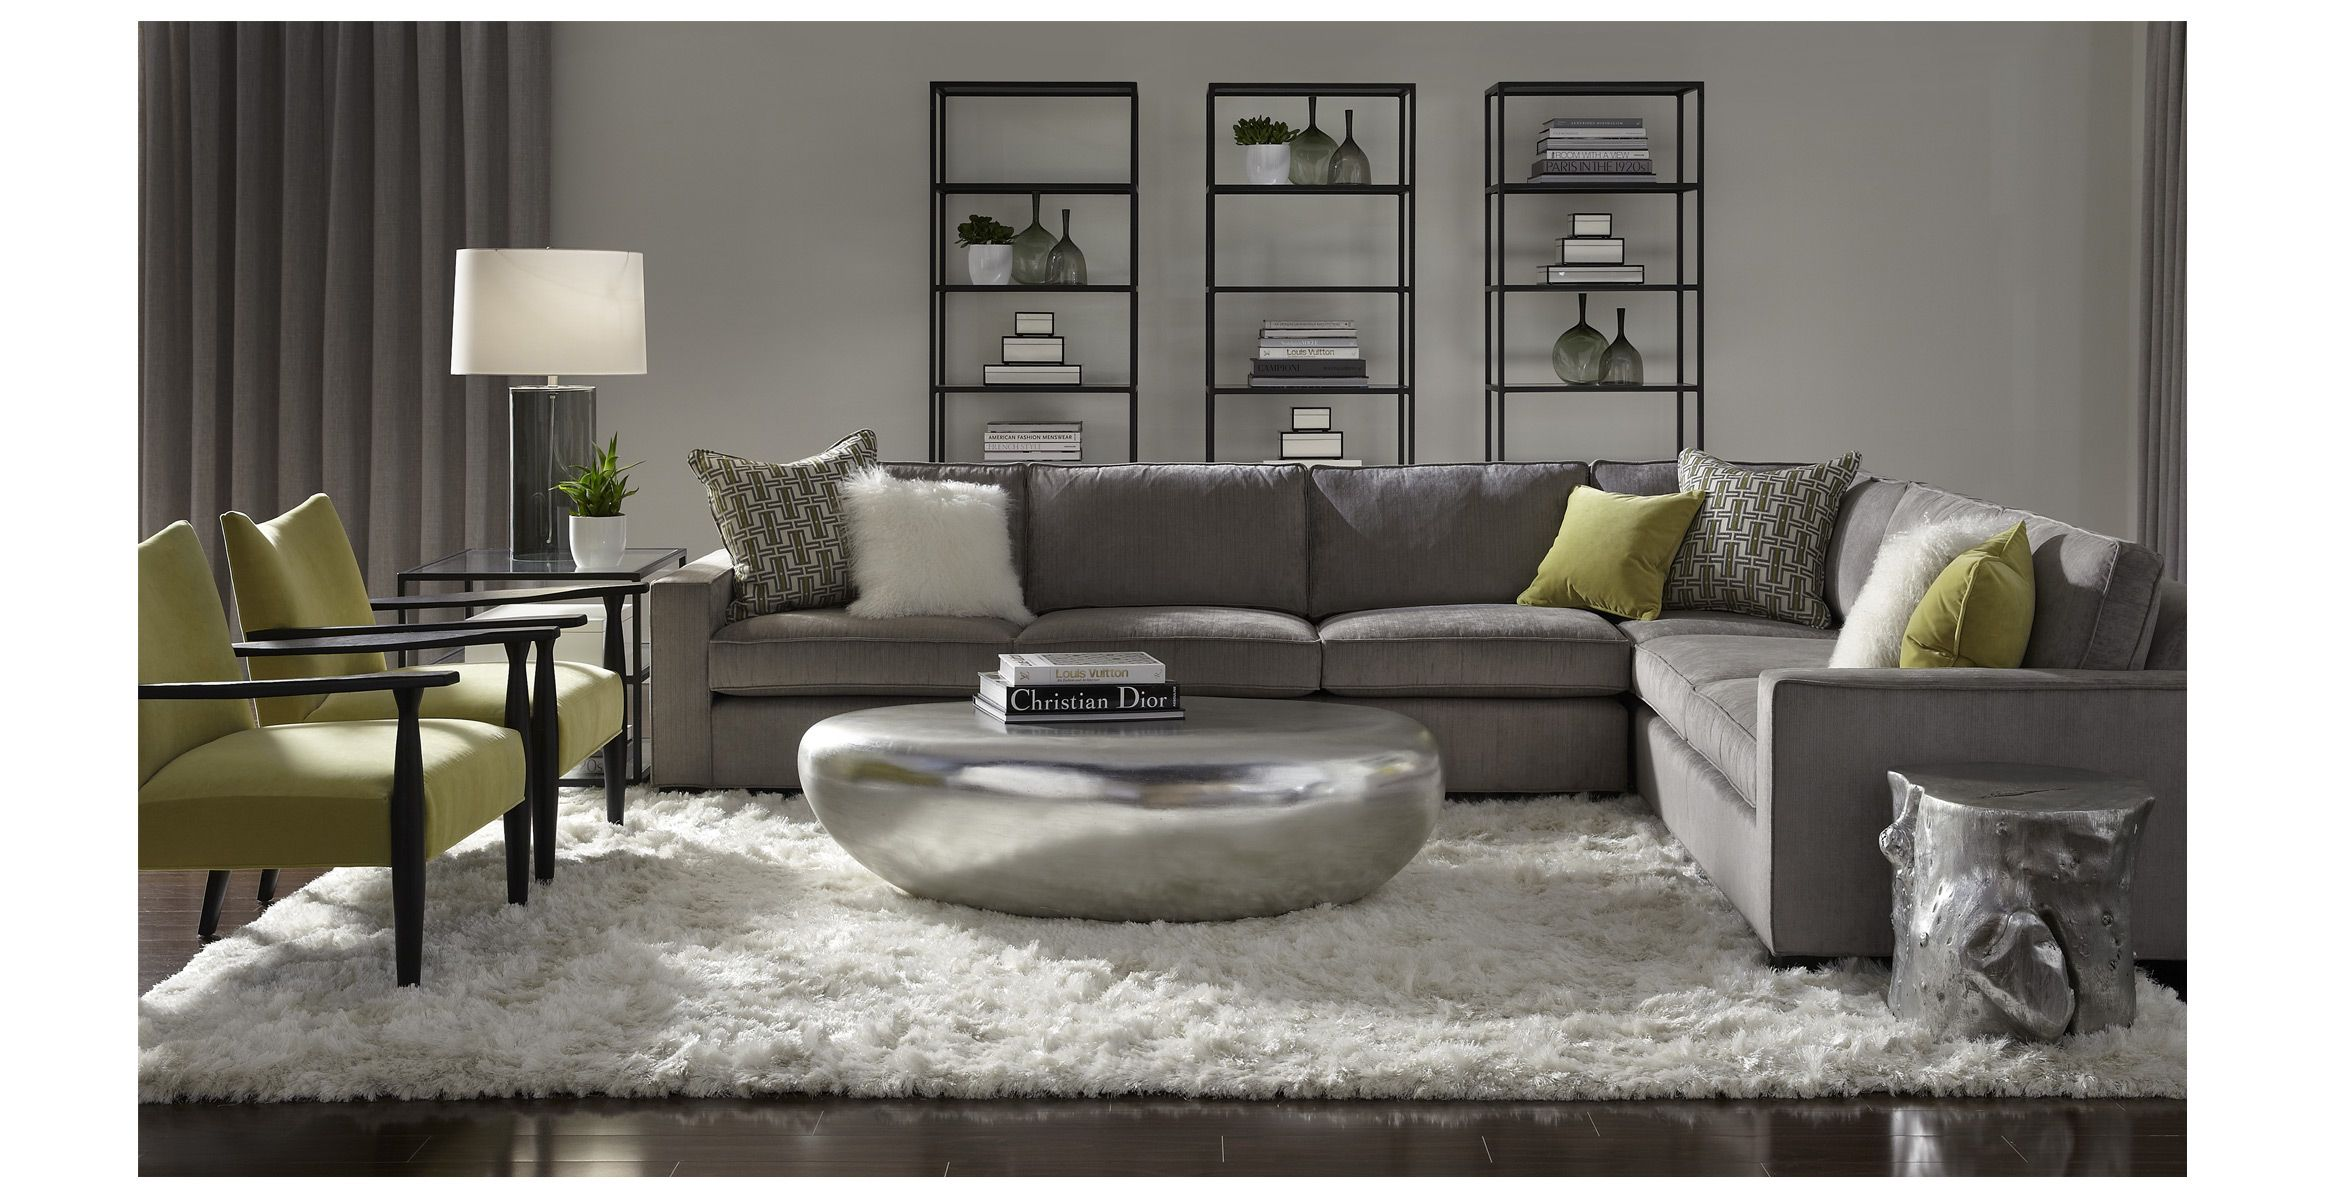 mitc gold and bob williams sofa kid friendly sectional sofas mitchell 43 carson slate gray